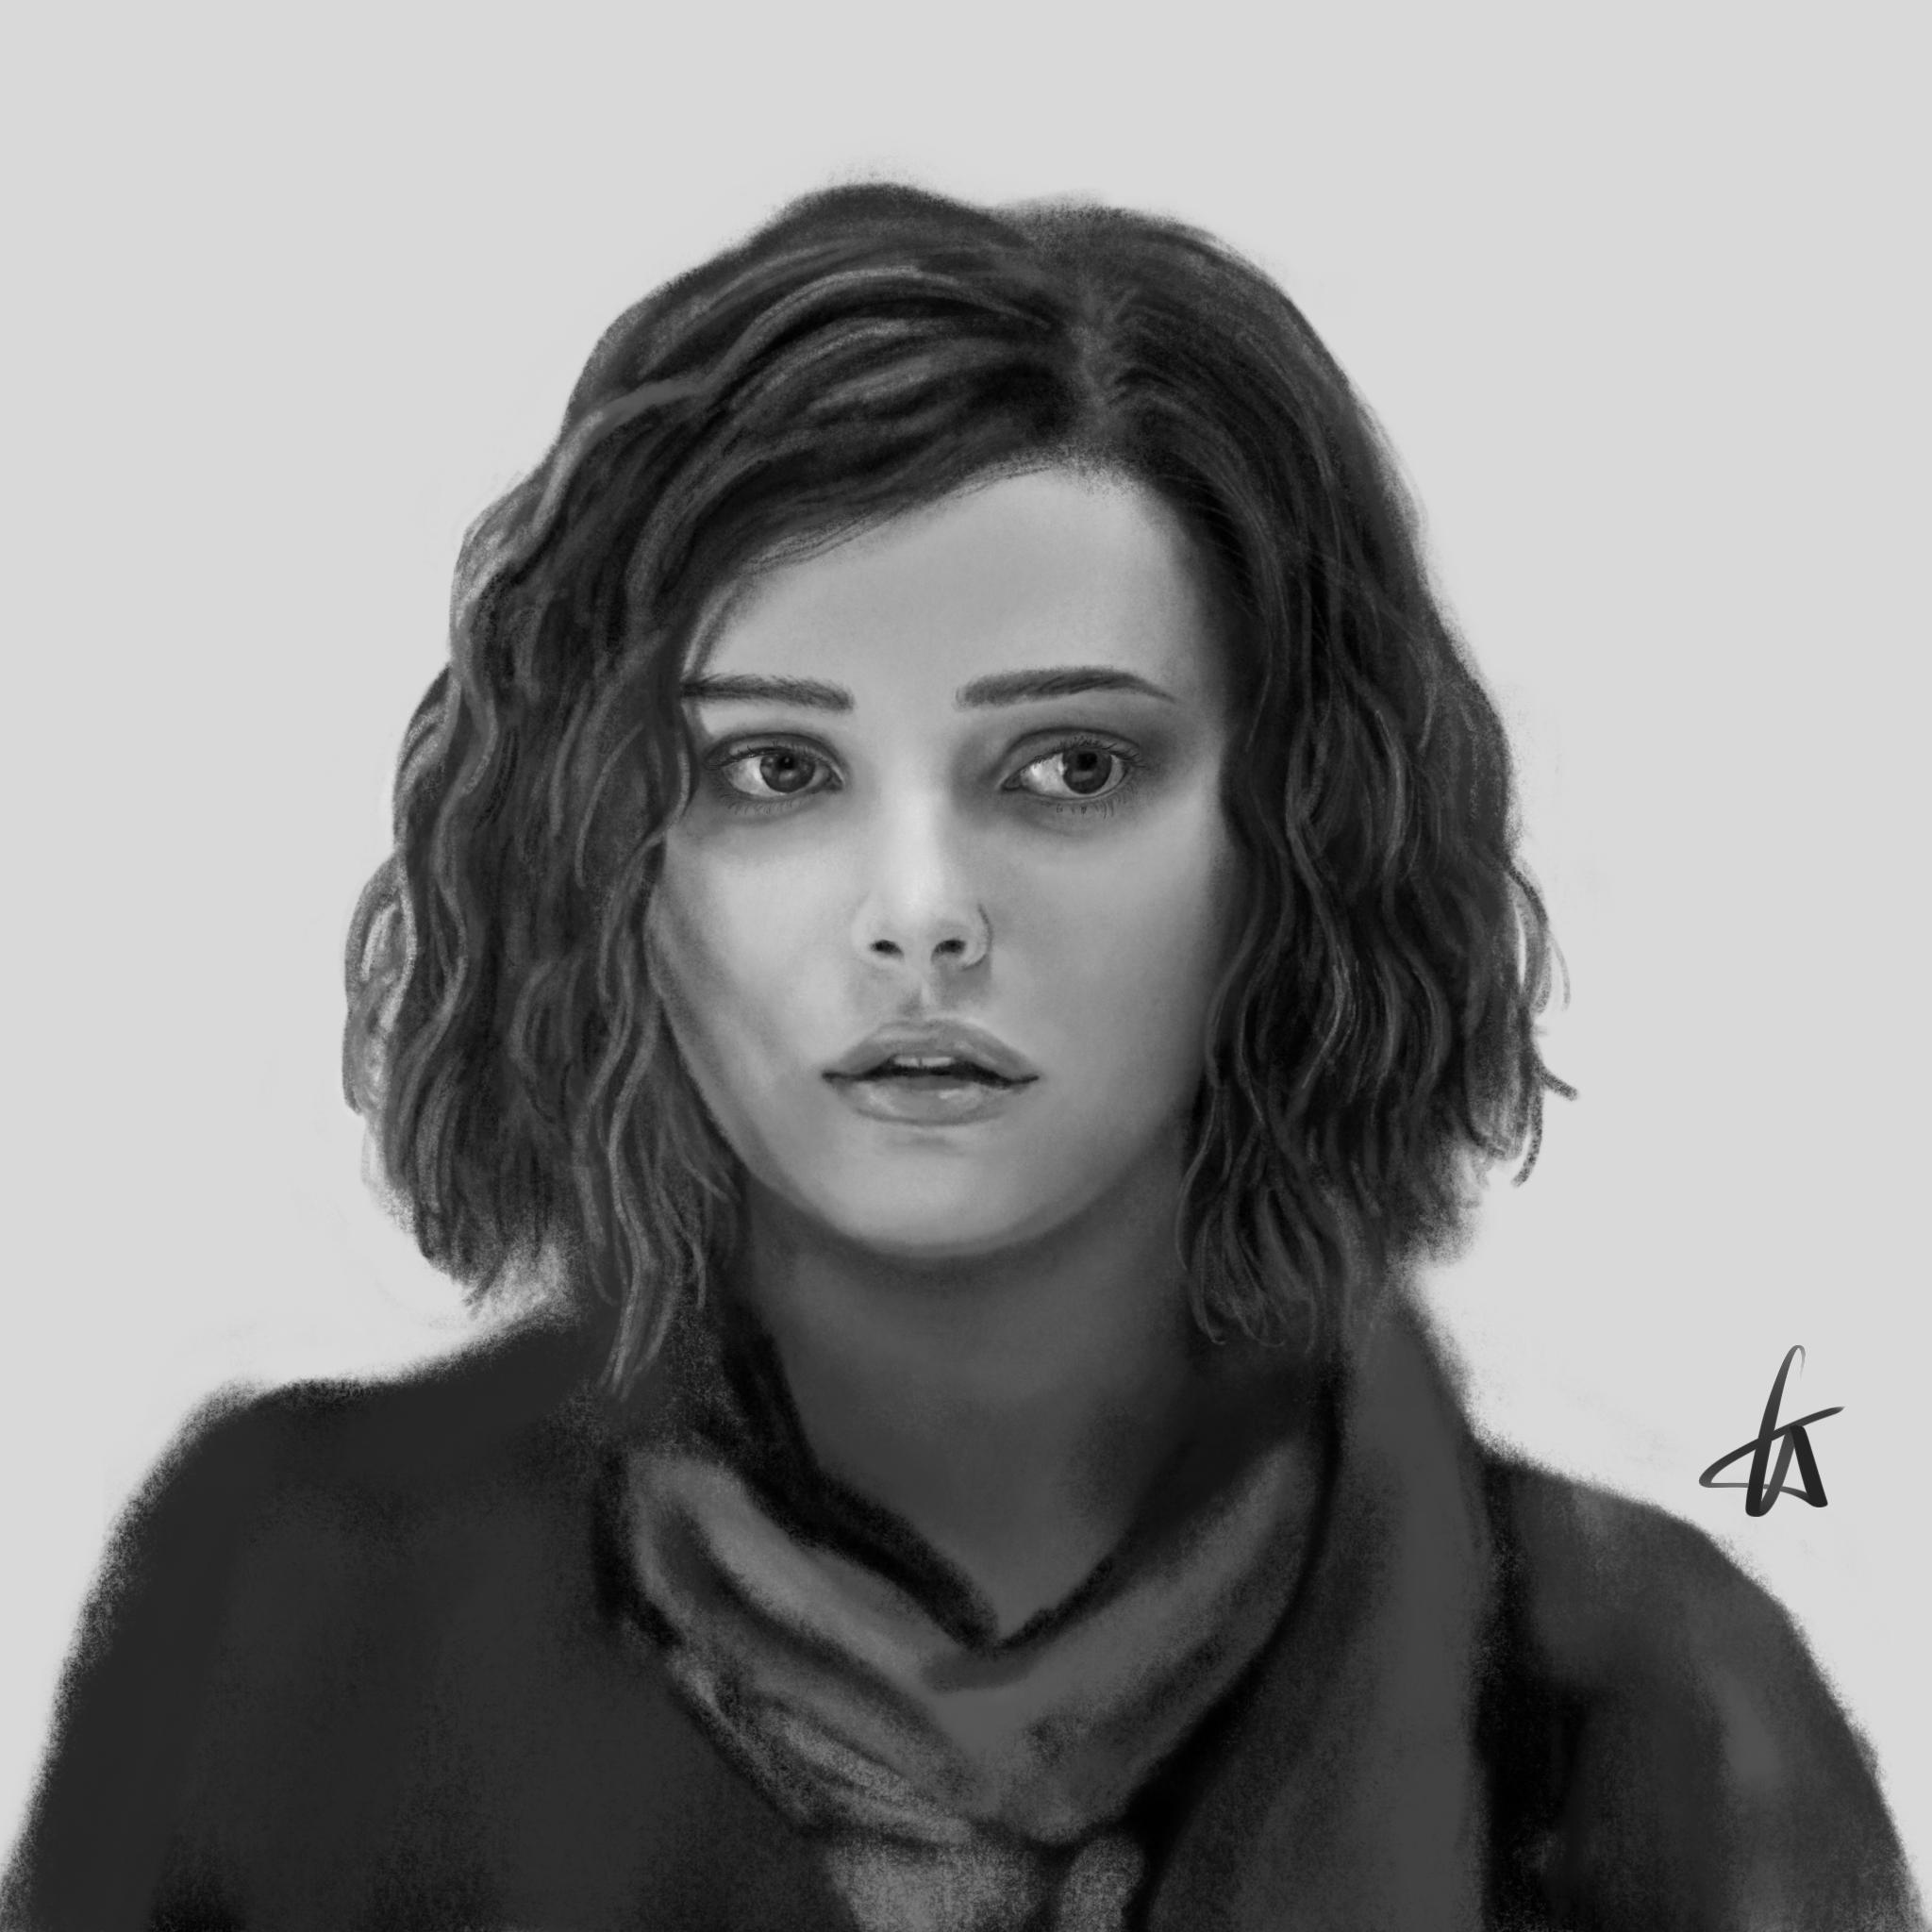 My Draw Of Hannah Baker